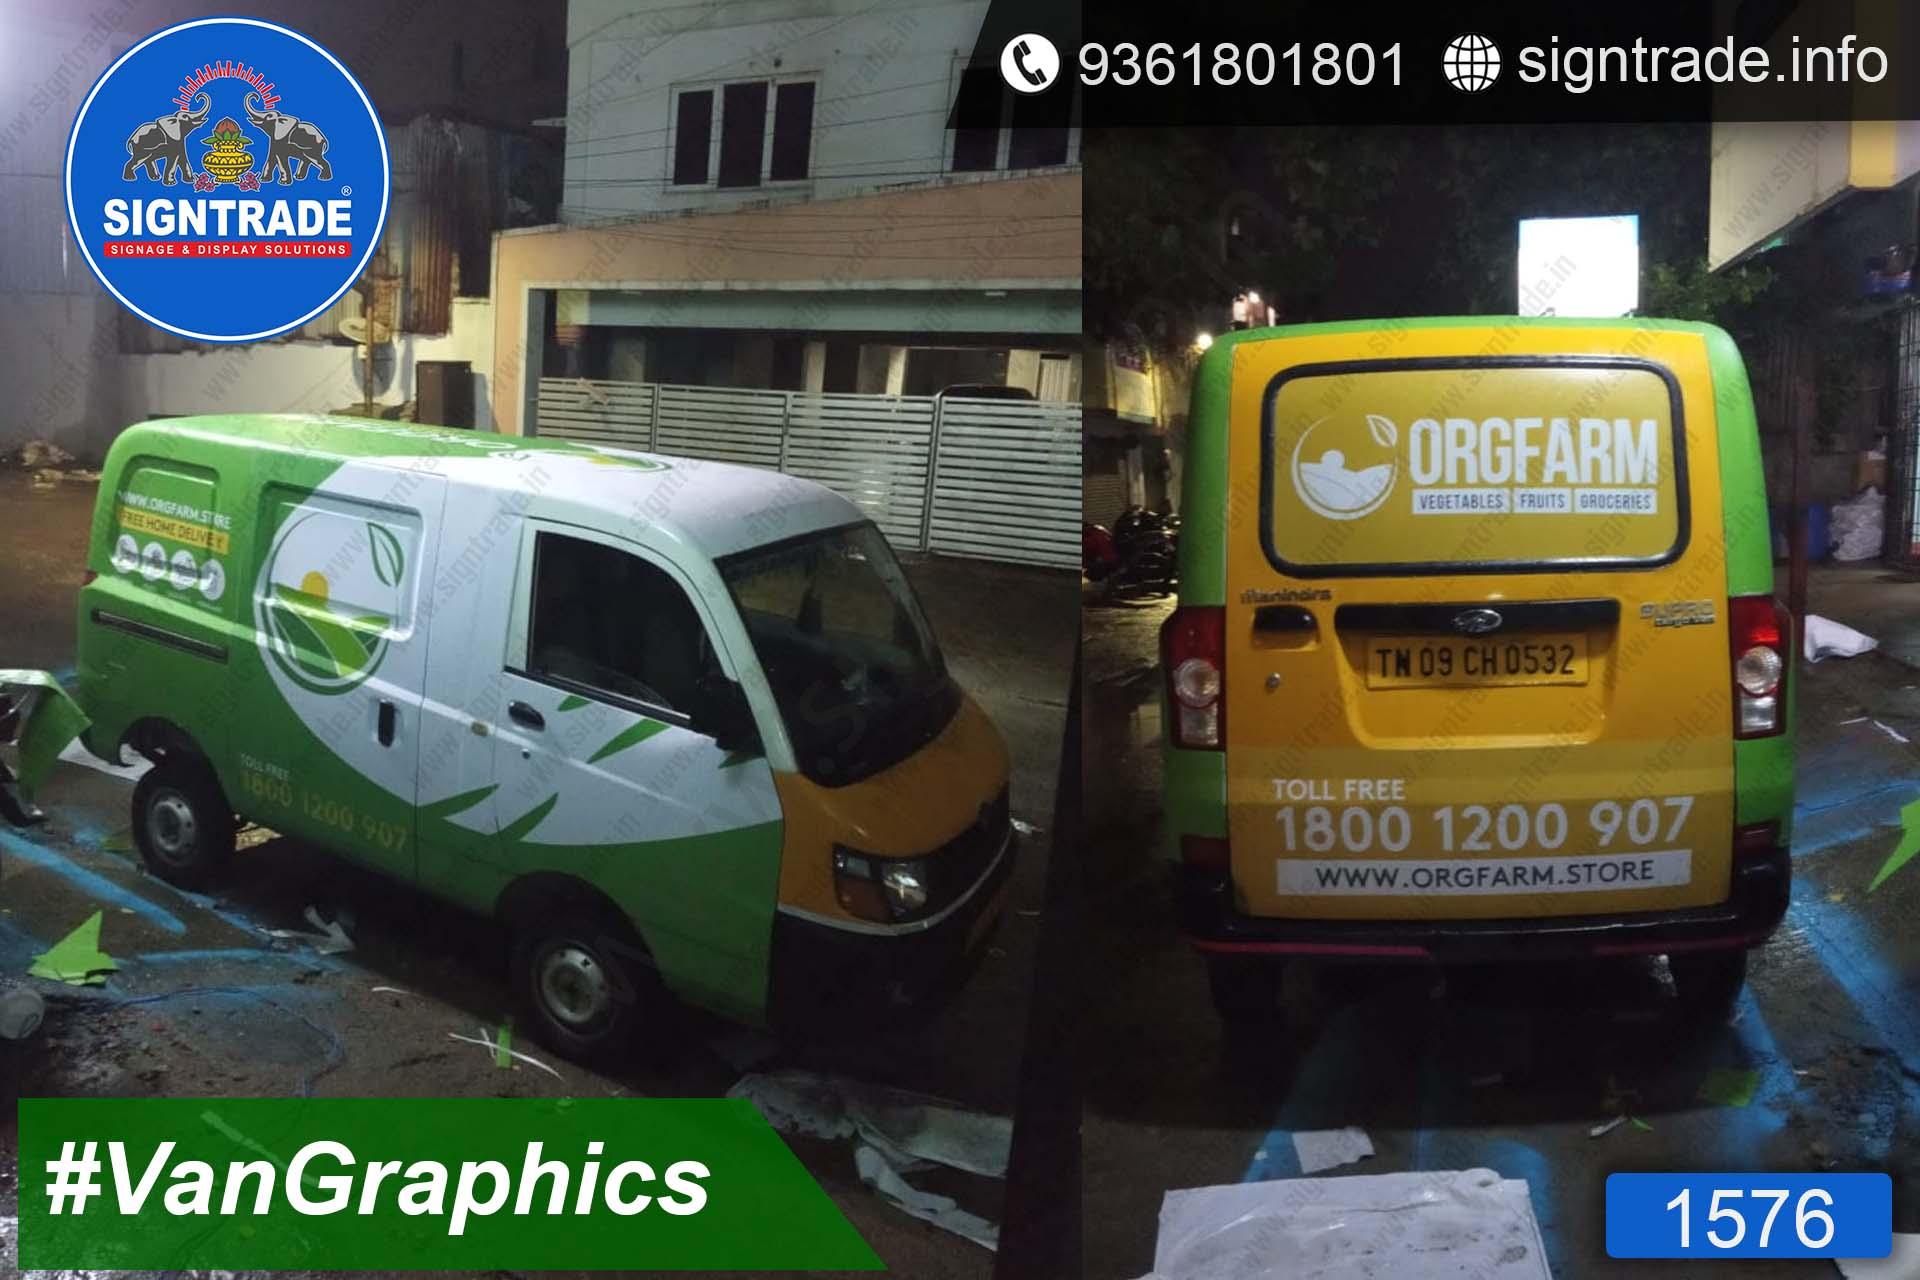 Orgfarm, Chennai - SIGNTRADE - Vinyl, Stickers, Van Graphics, Vehicle Graphics and Wraps Service Provider in Chennai